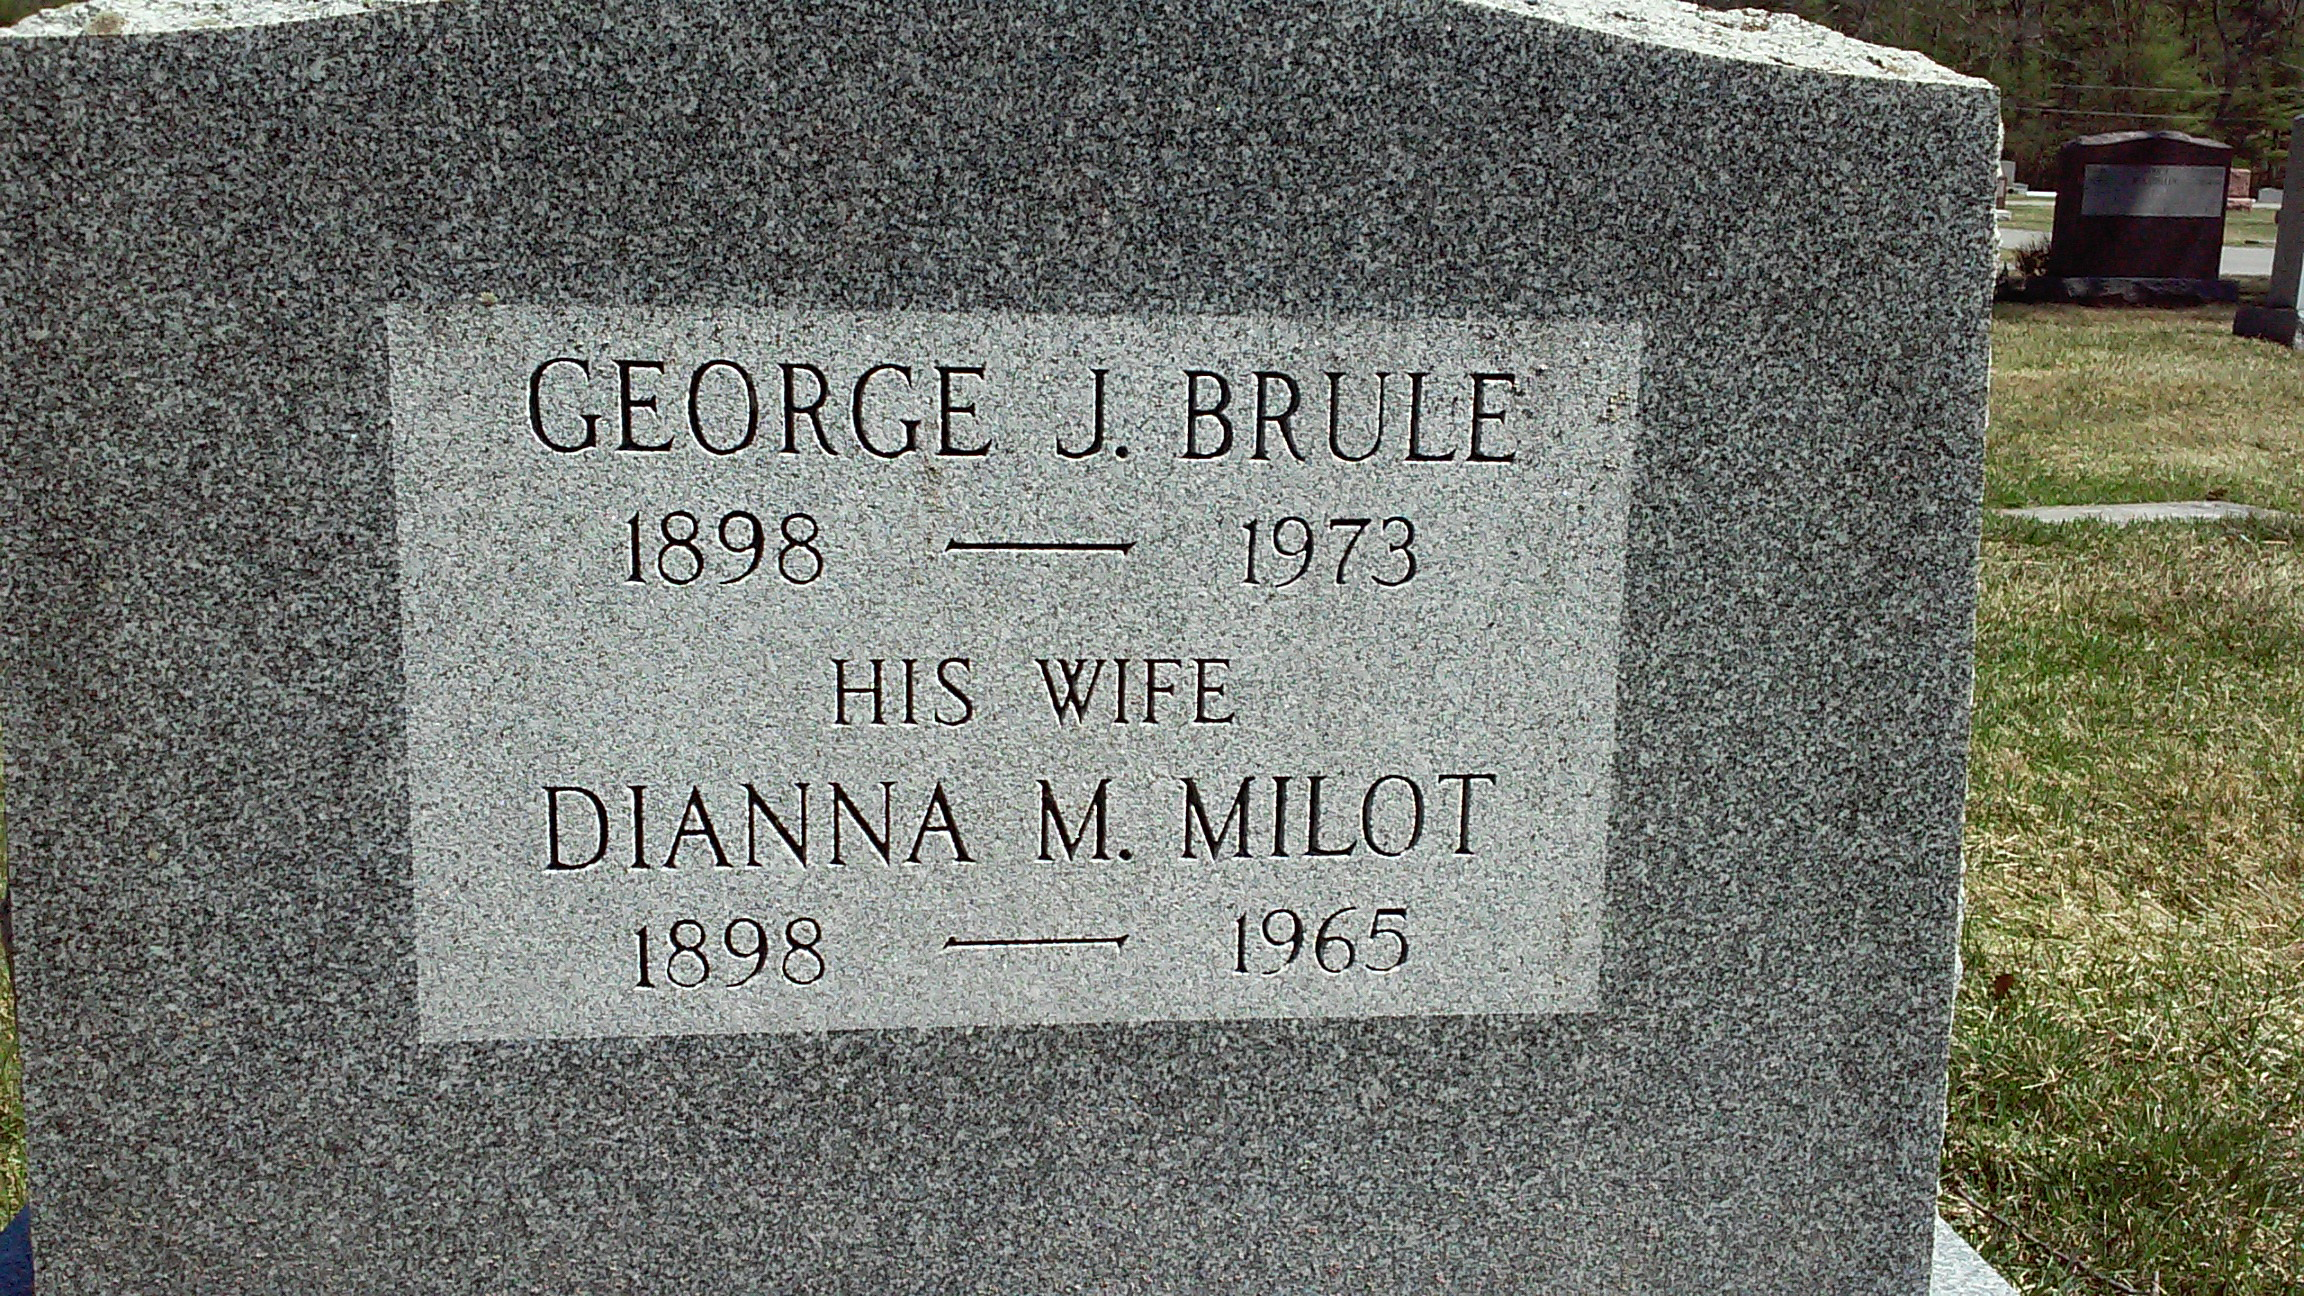 Joseph Brule